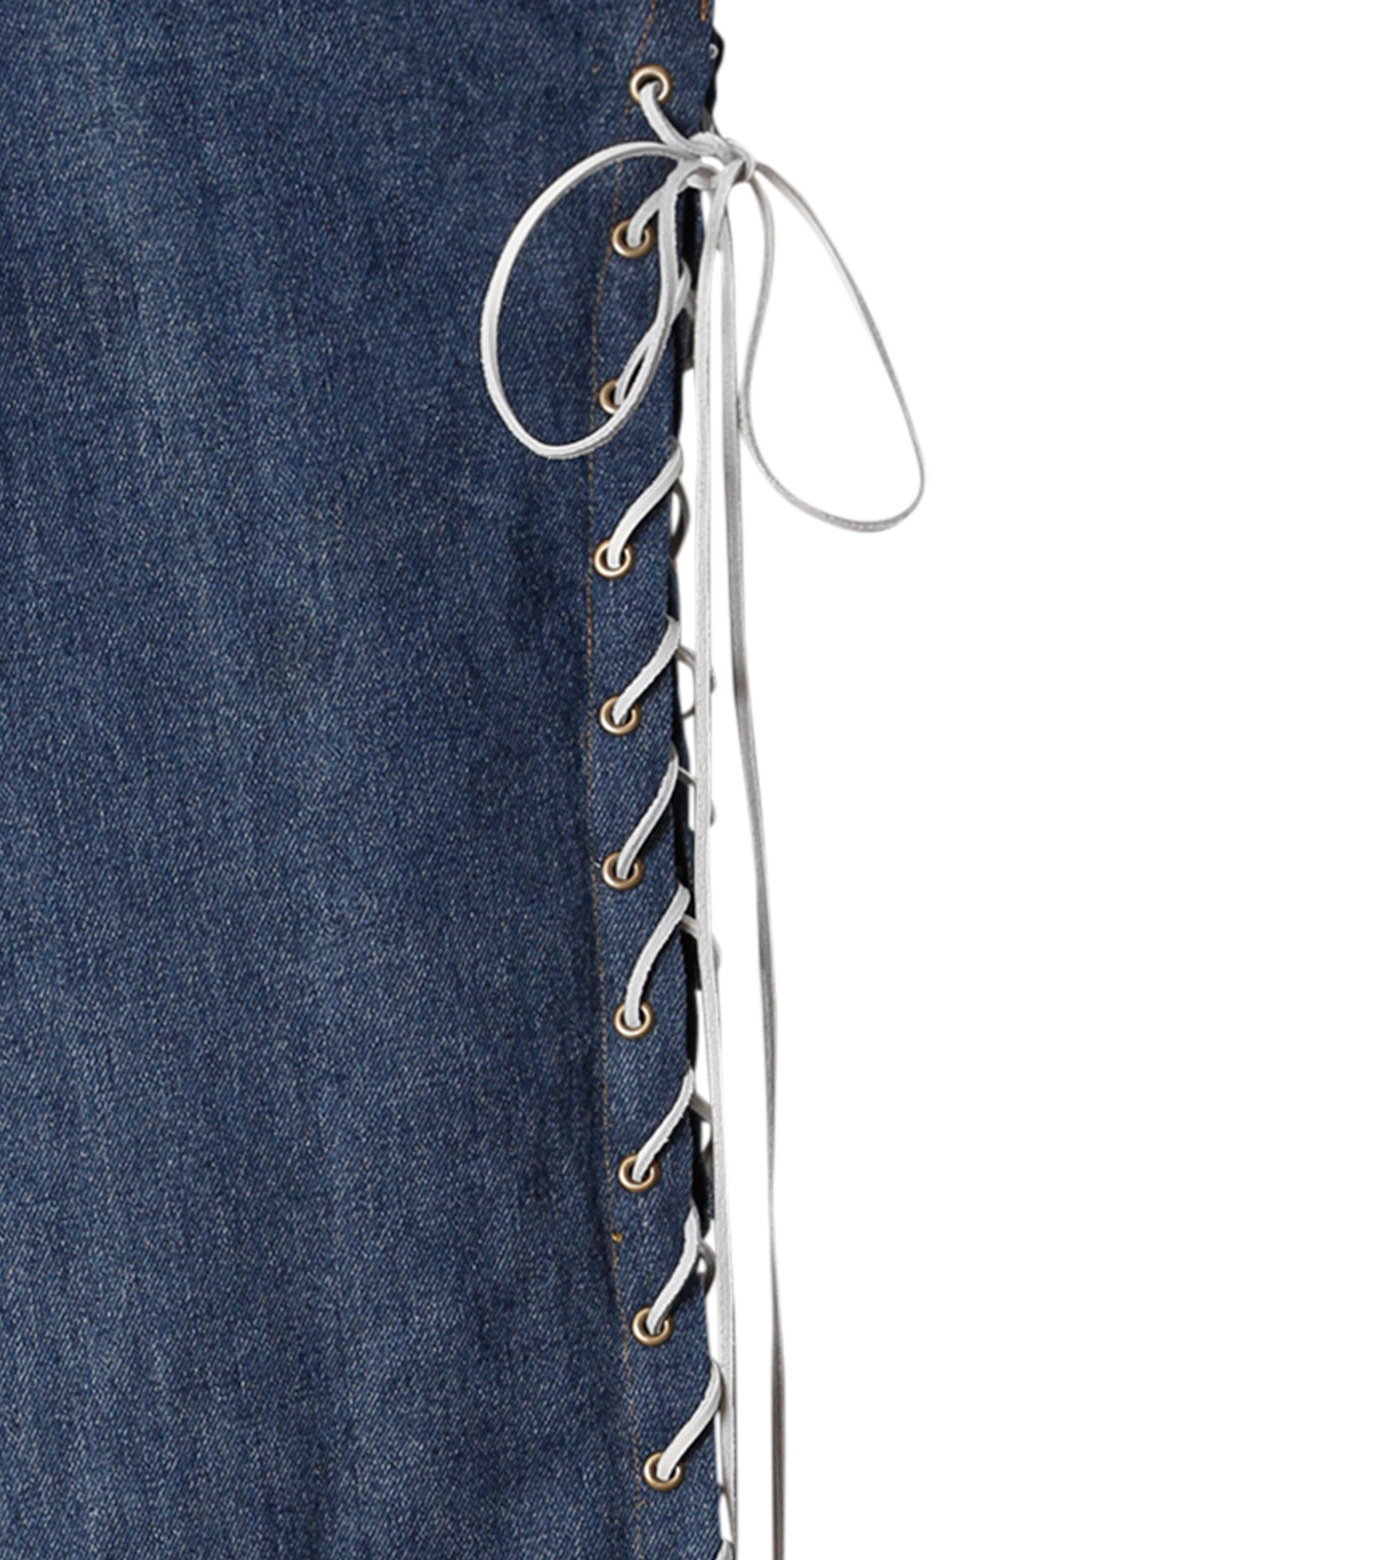 77circa(77サーカ)のCut Back Lace Up Denim Pants-INDIGO(デニム/denim)-CC16AW-46-94 拡大詳細画像3